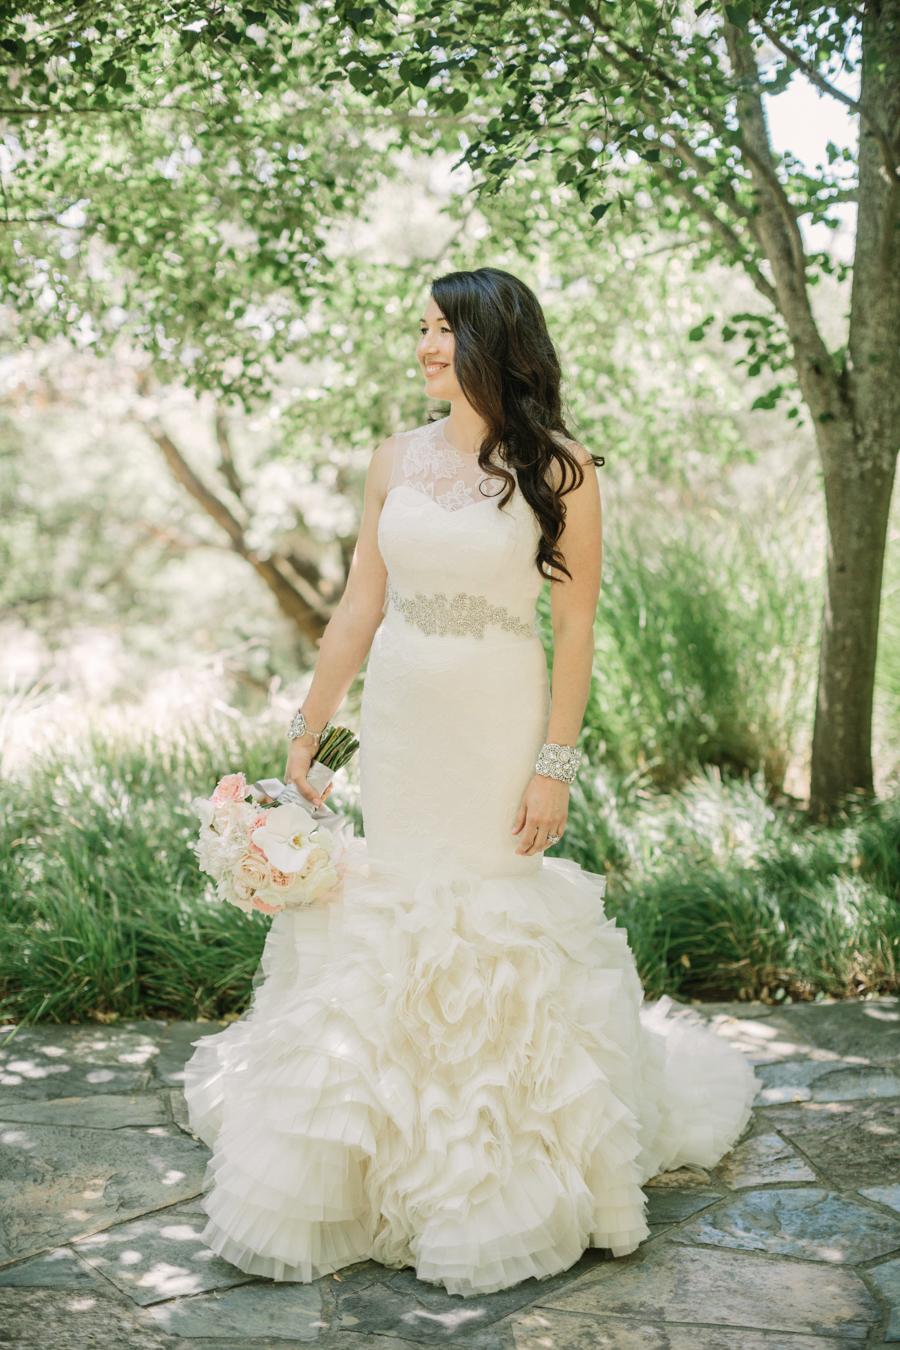 Bride in Vera Wang Gown